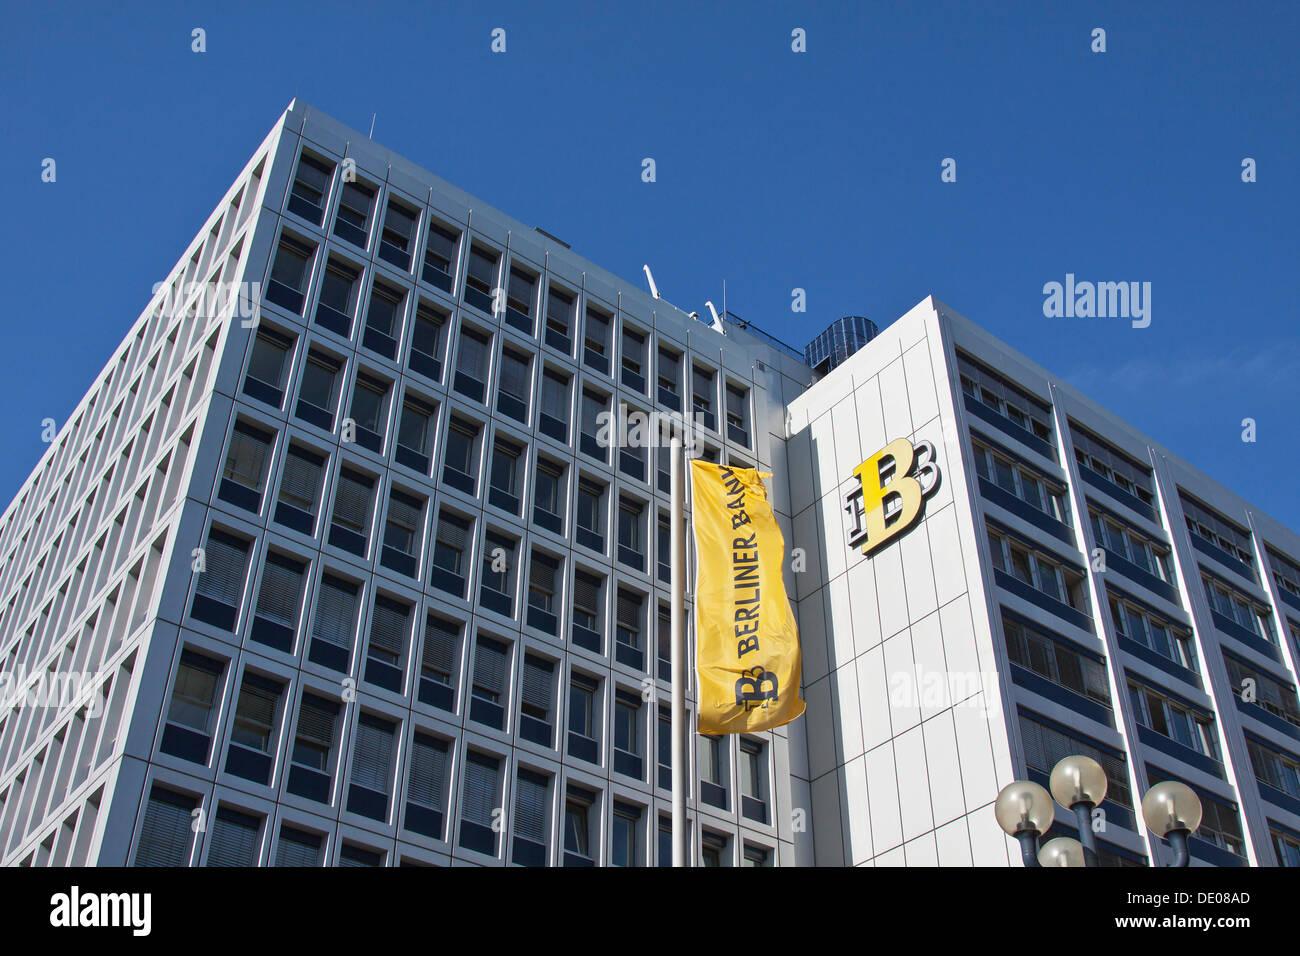 Berliner Bank Stock Photos & Berliner Bank Stock Images - Alamy on